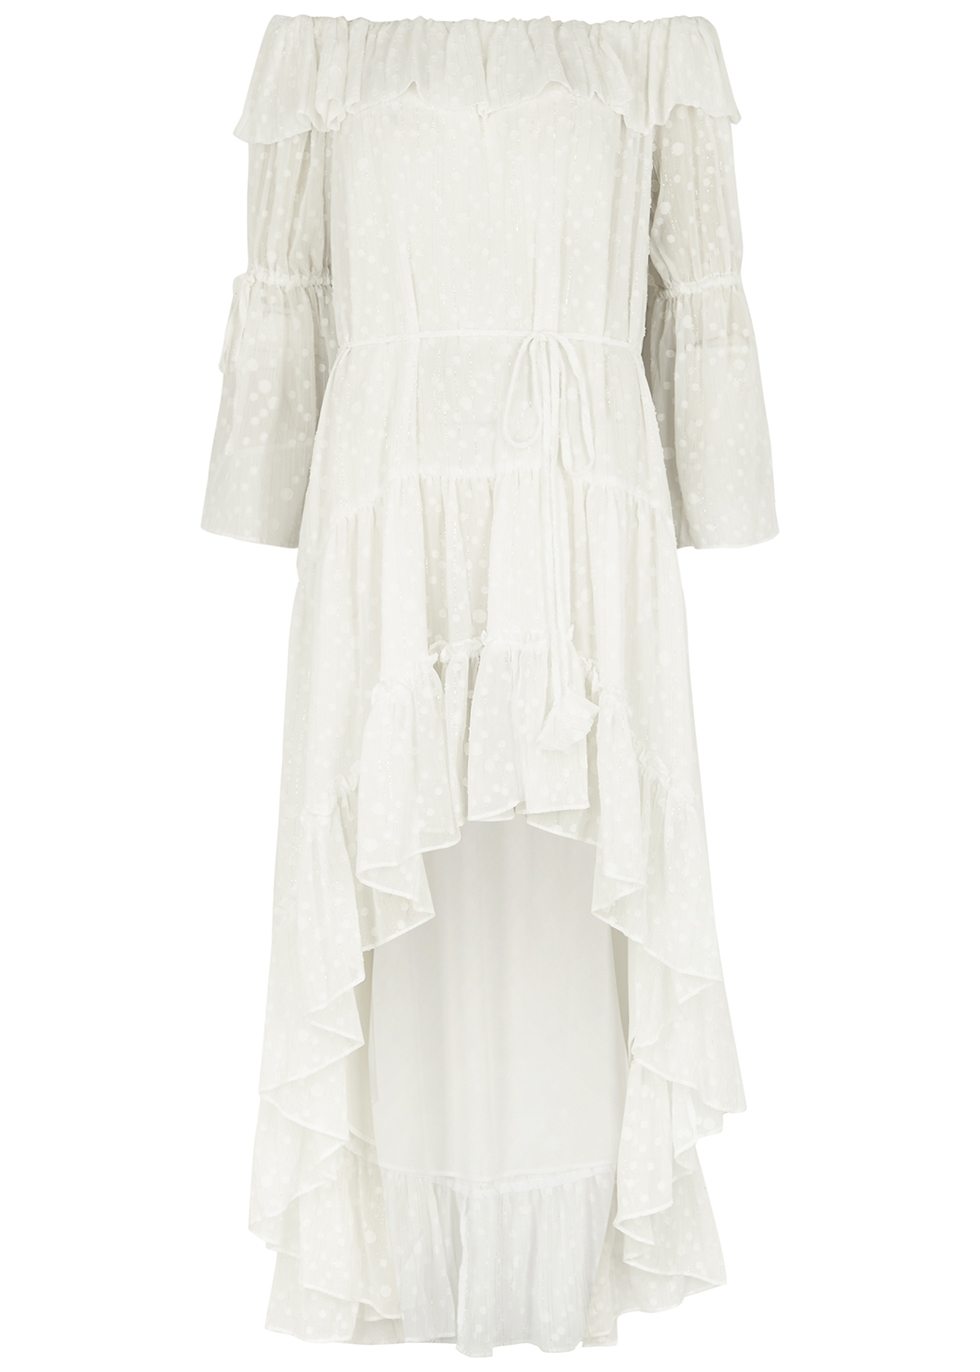 Aerin off-white ruffle-trimmed chiffon midi dress